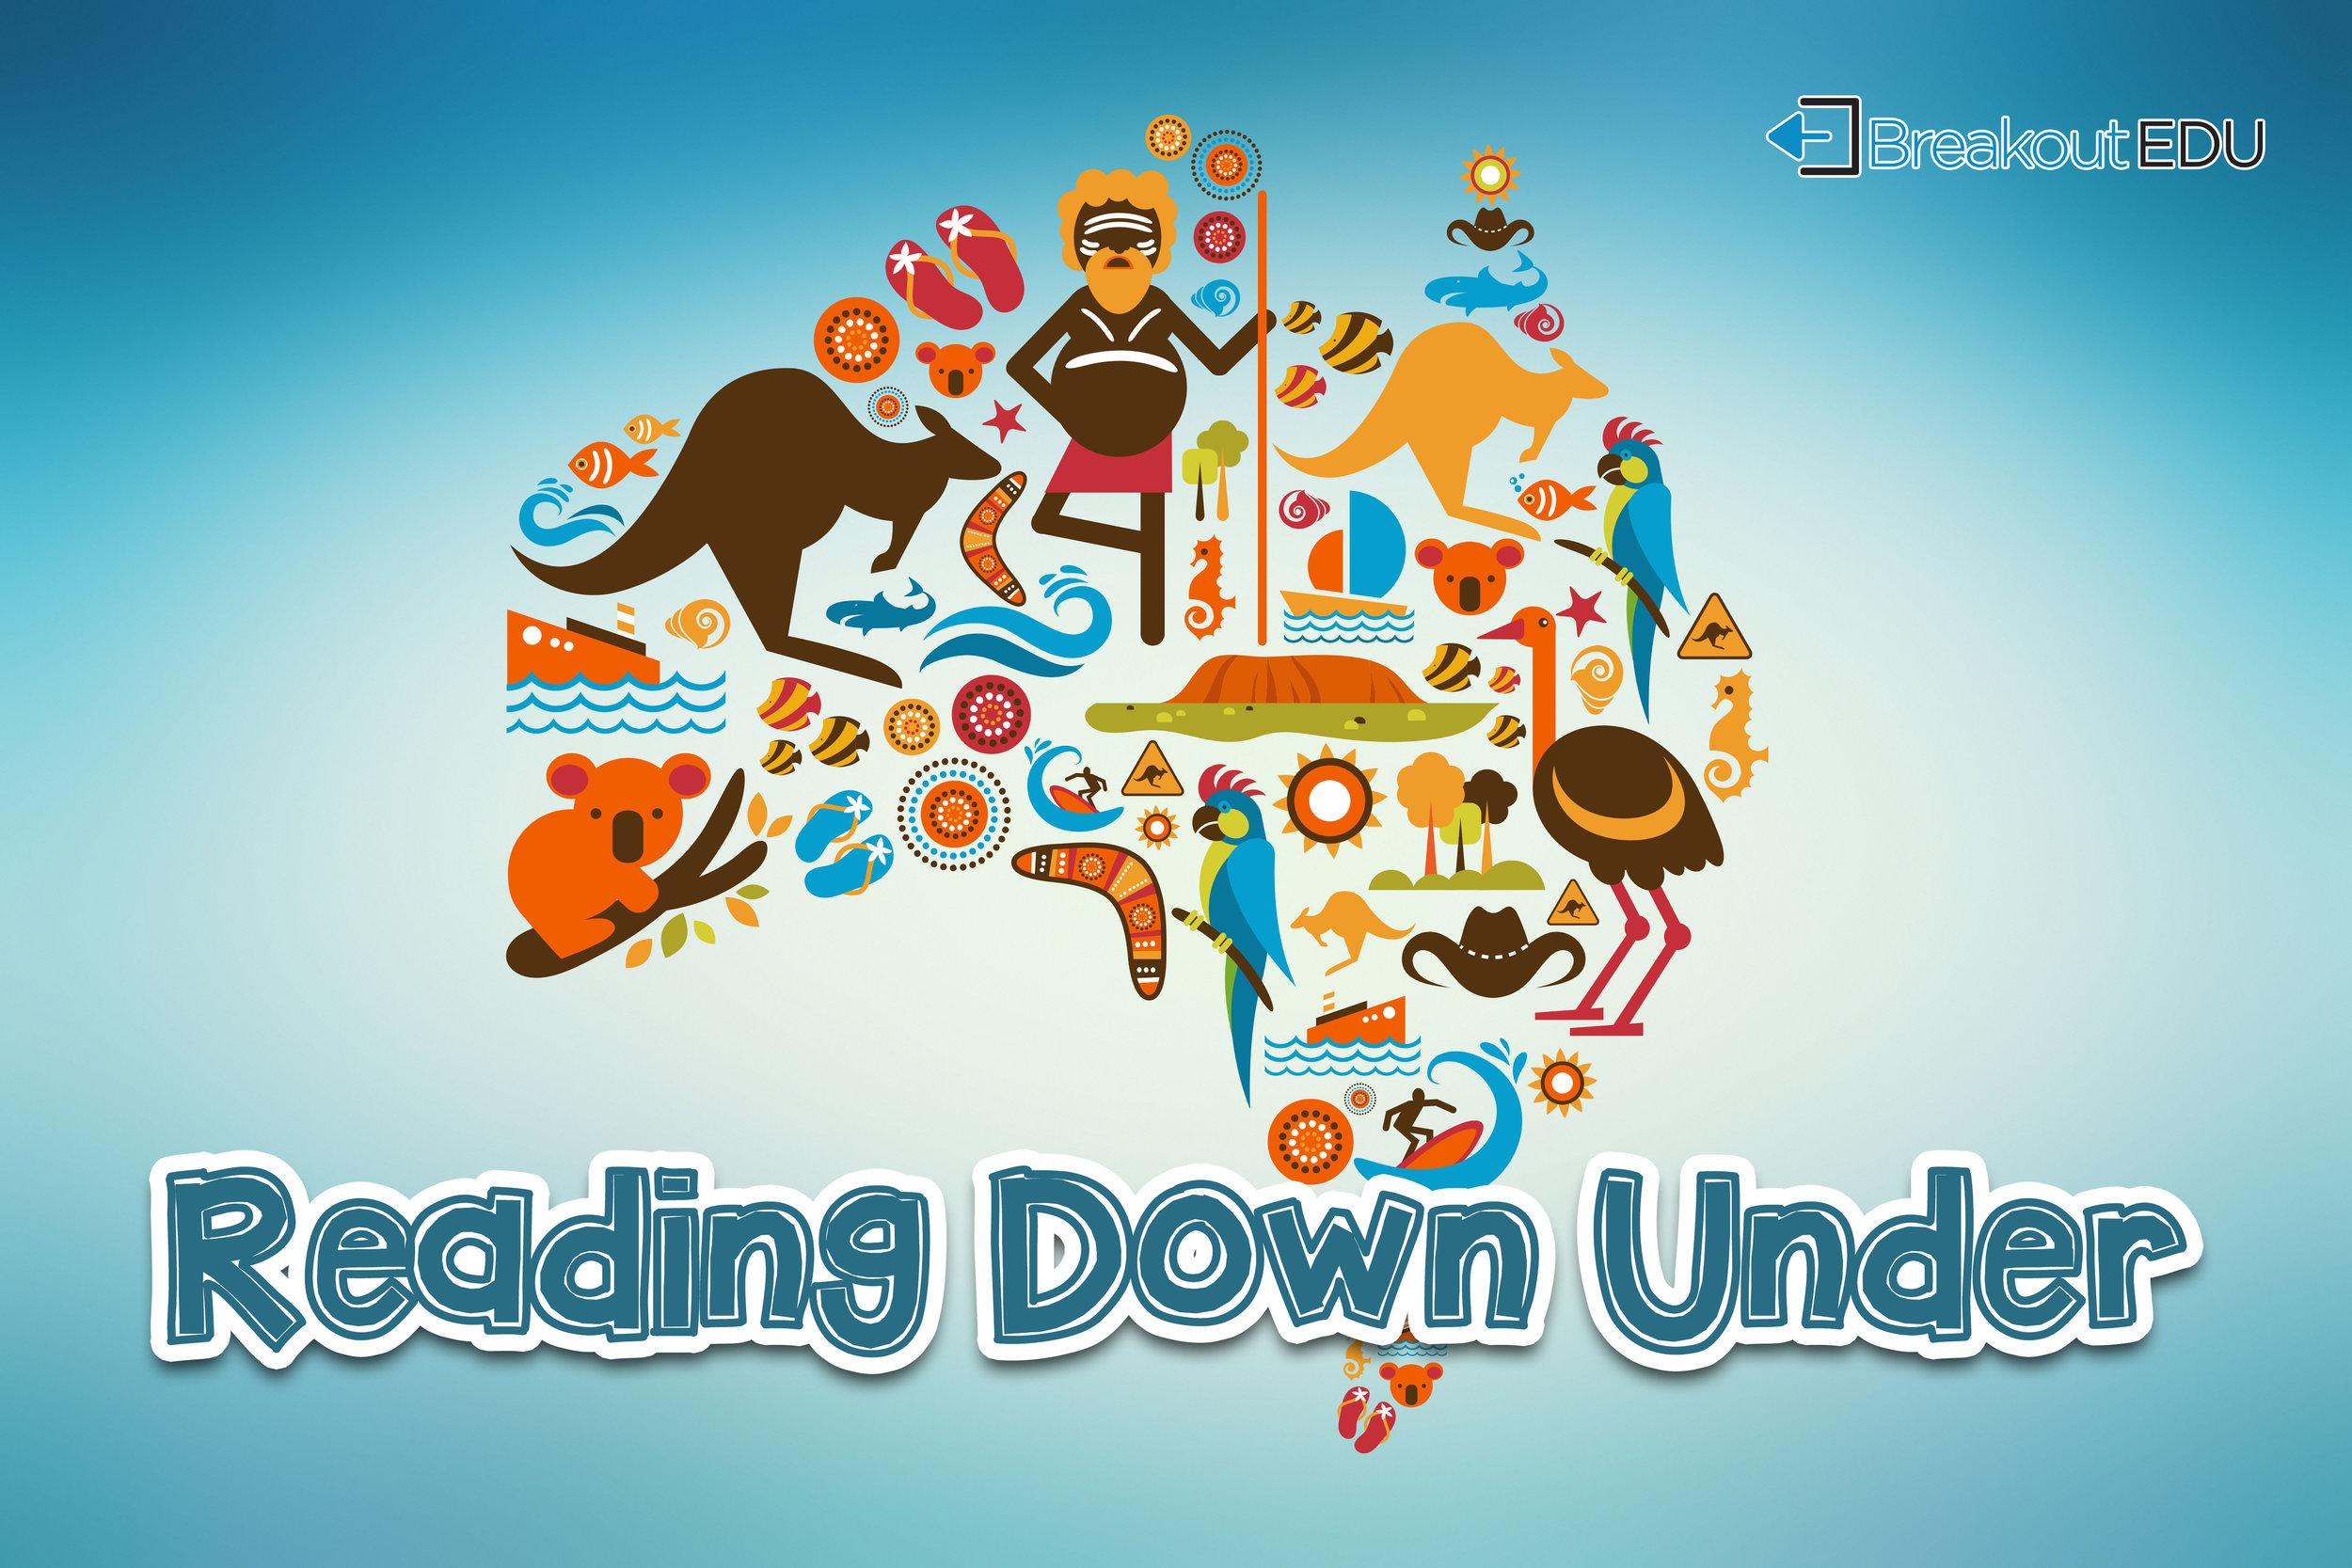 readingdownunder (1).jpg